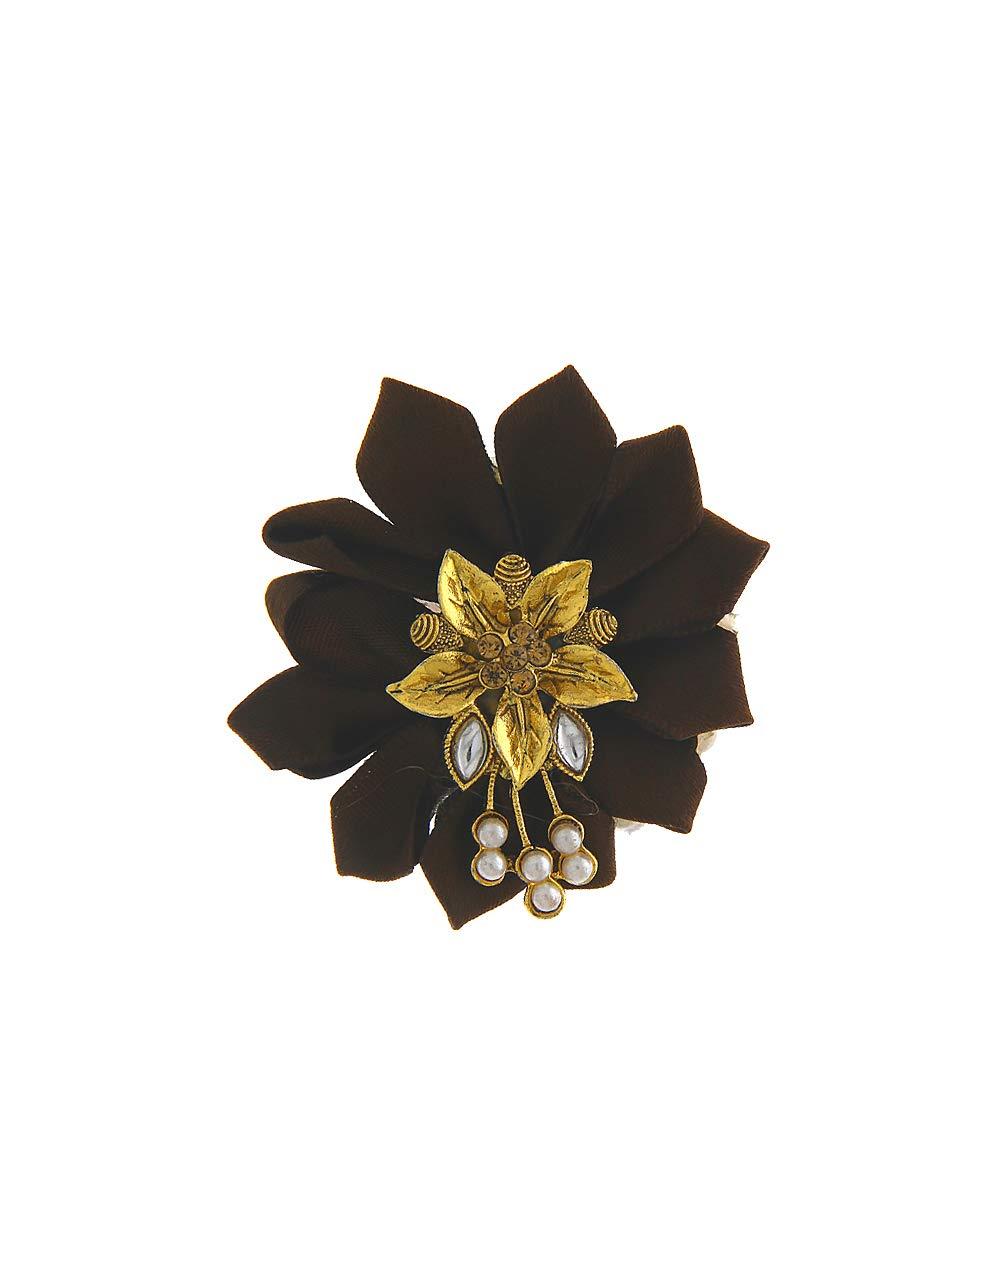 Anuradha Art Brown Colour Styled with Flower Wonderful Designer Sari/Saree Pin for Women/Girls